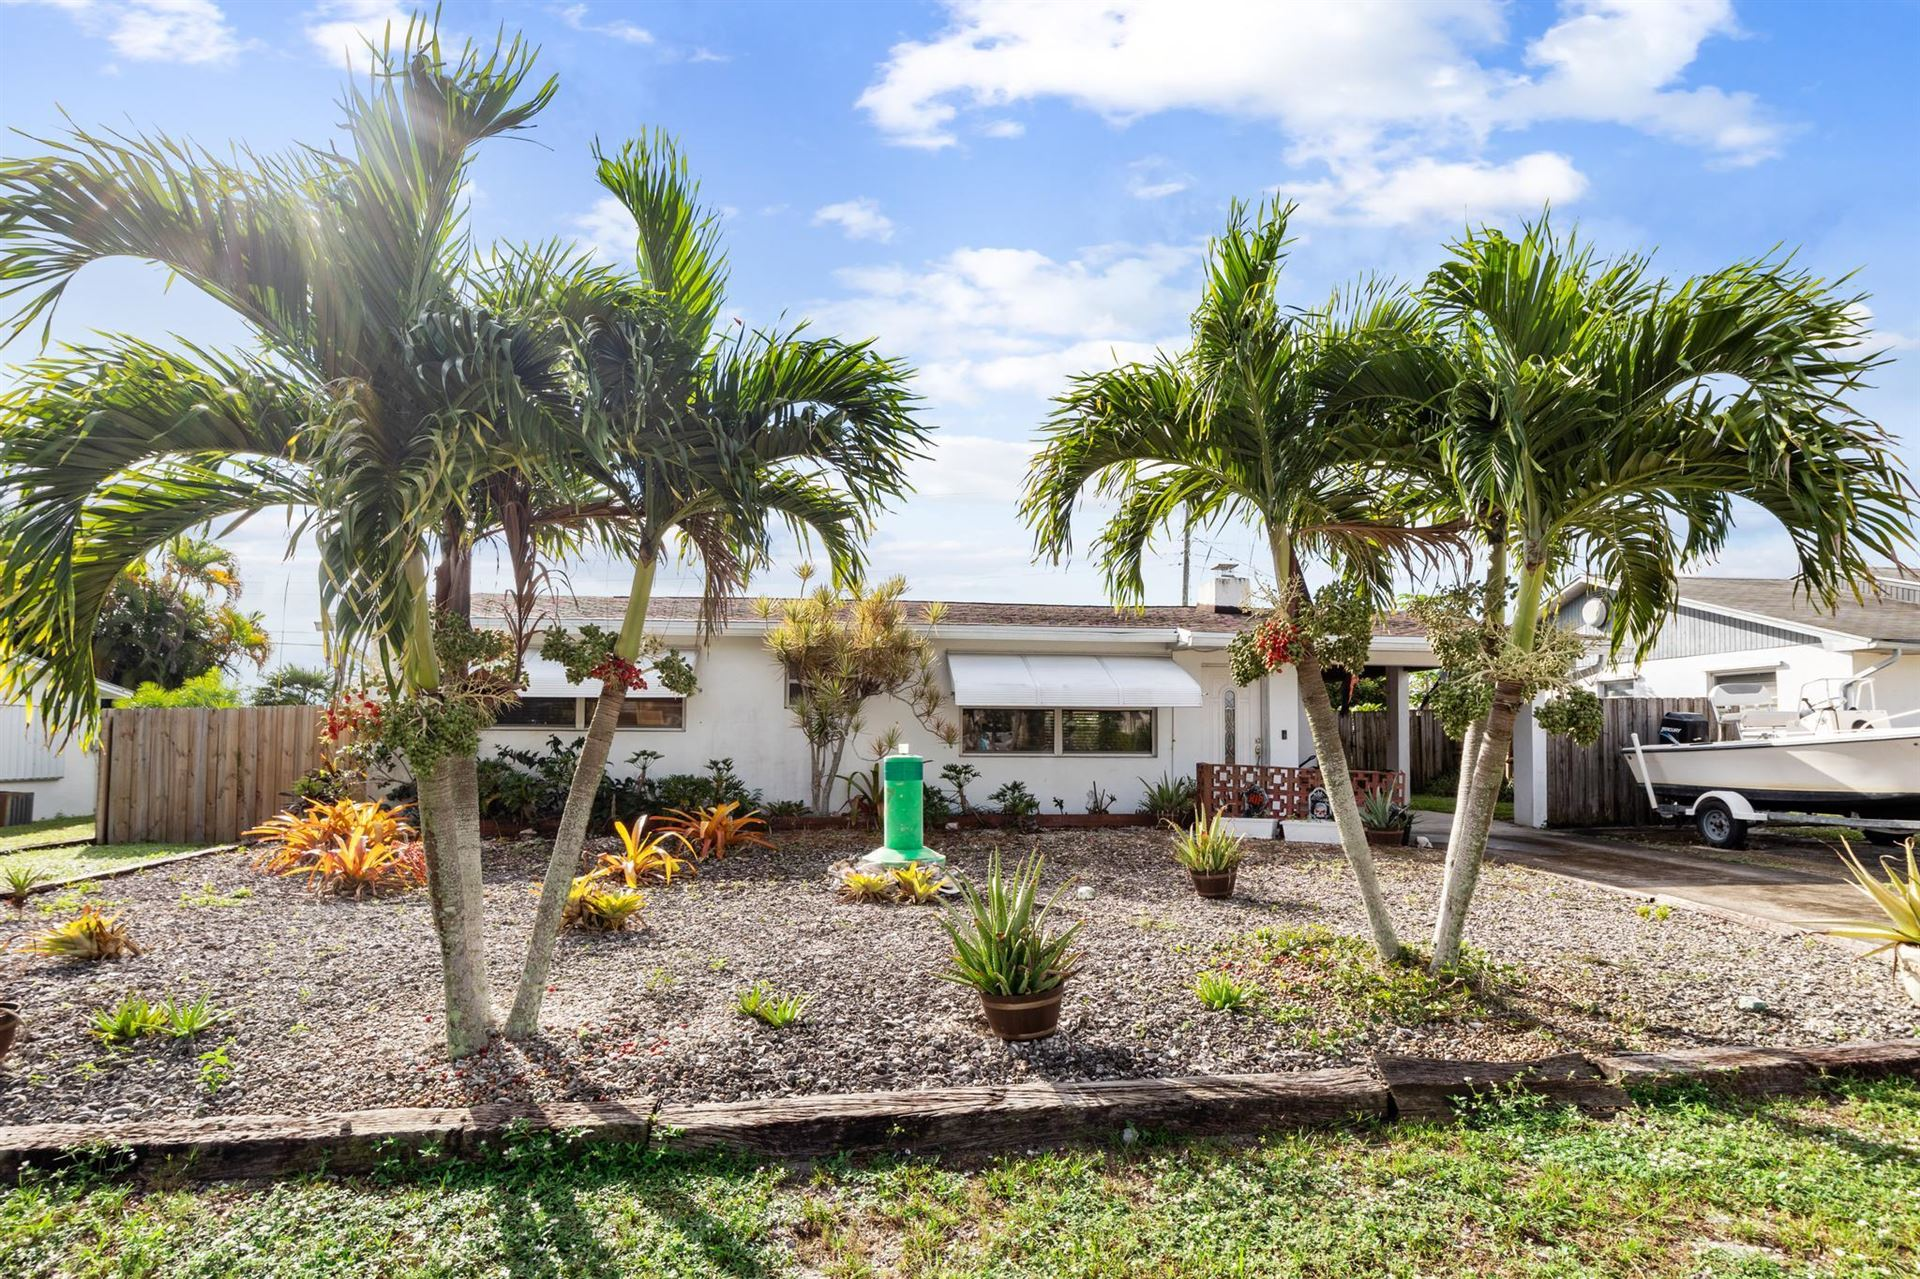 8267 SE Pine Circle, Hobe Sound, FL 33455 - MLS#: RX-10755148